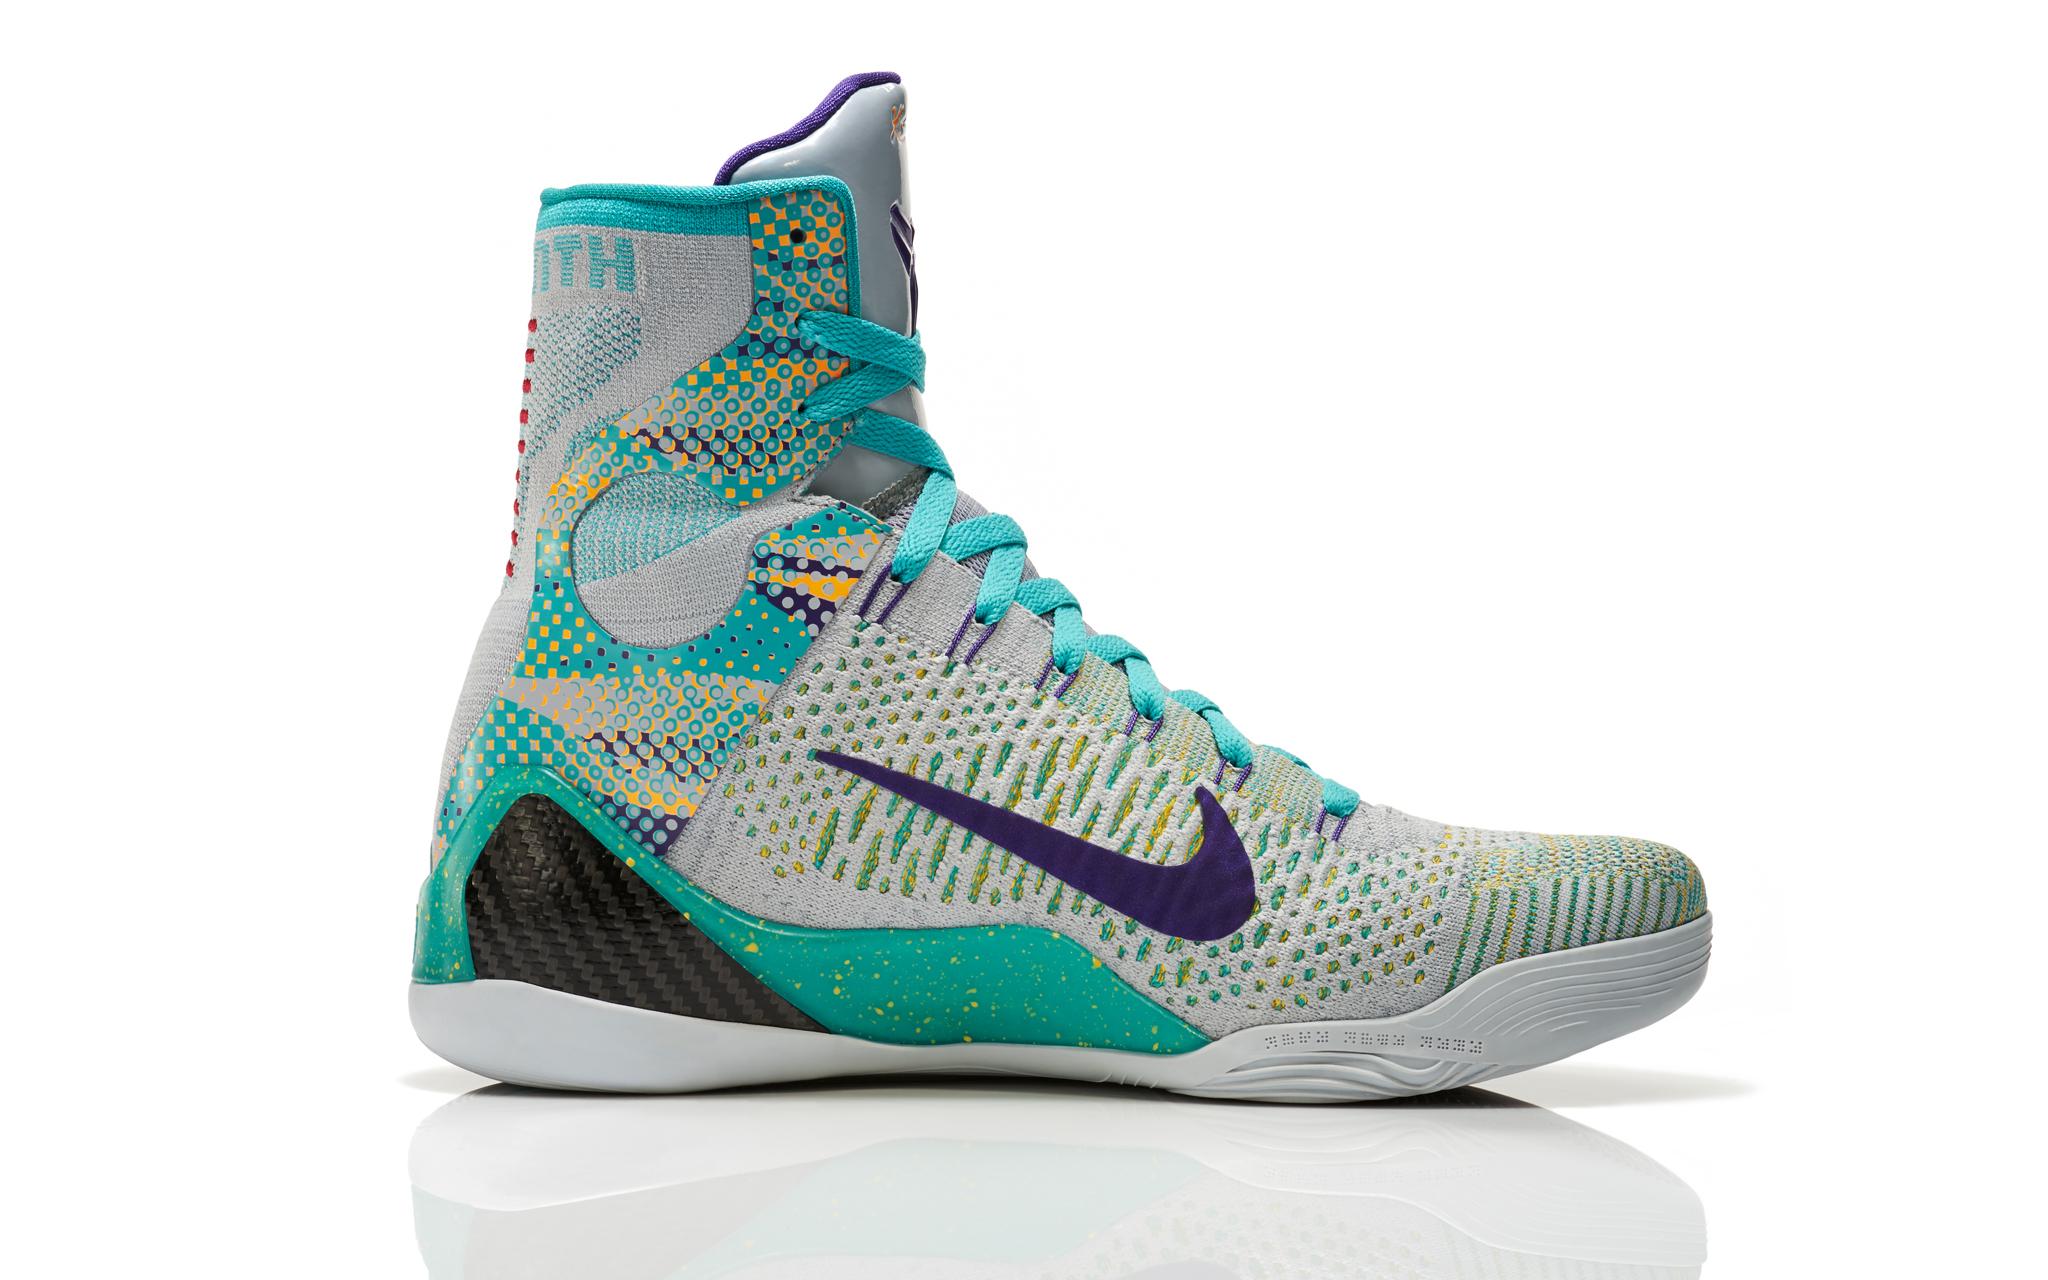 68d8d5 Cheap Kobe 9 High Tops Cheap Discount Kobe 9 Shoes